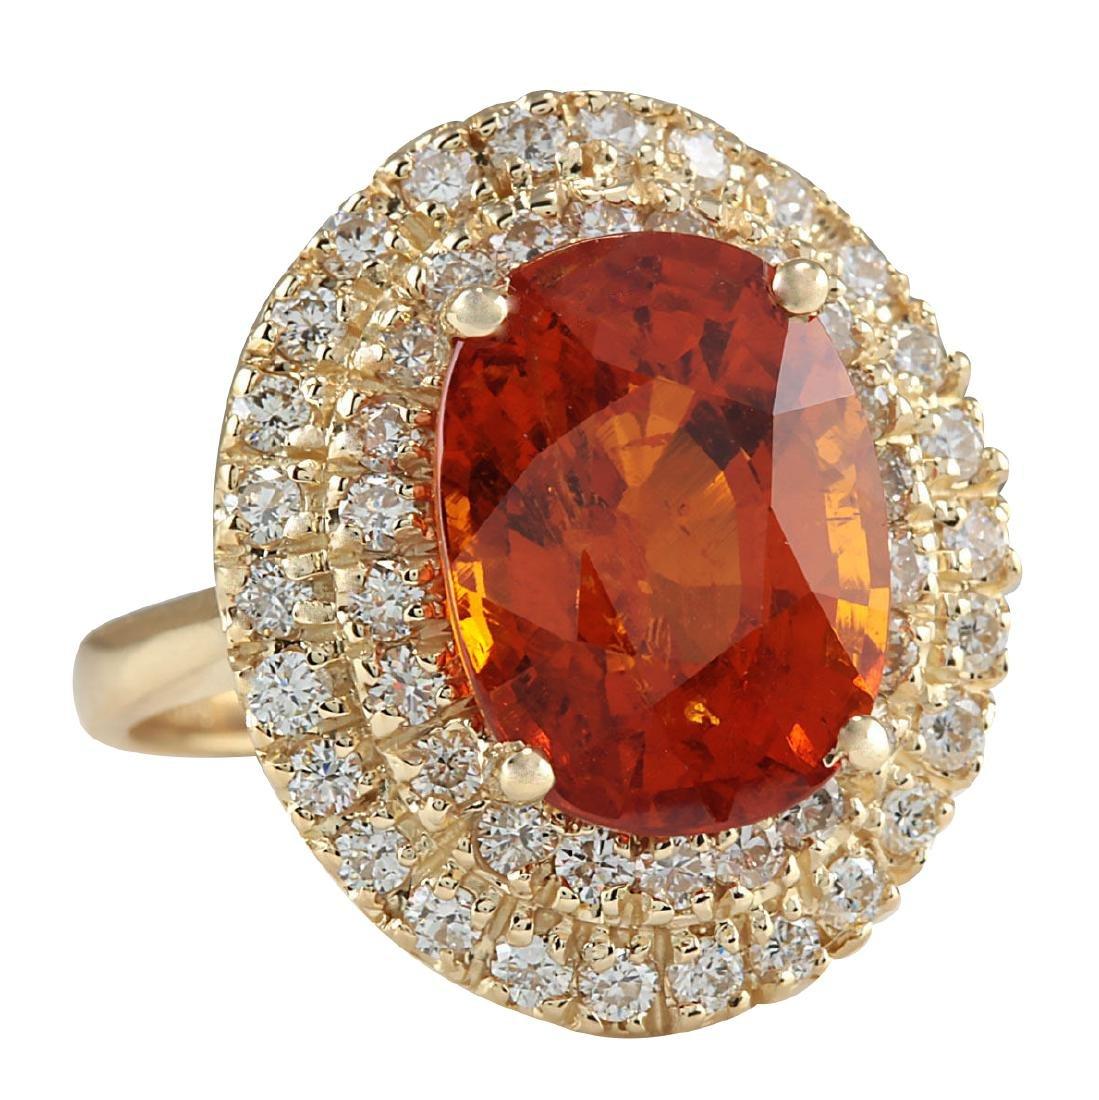 11.64CTW Natural Mandarin Garnet And Diamond Ring 18K - 2